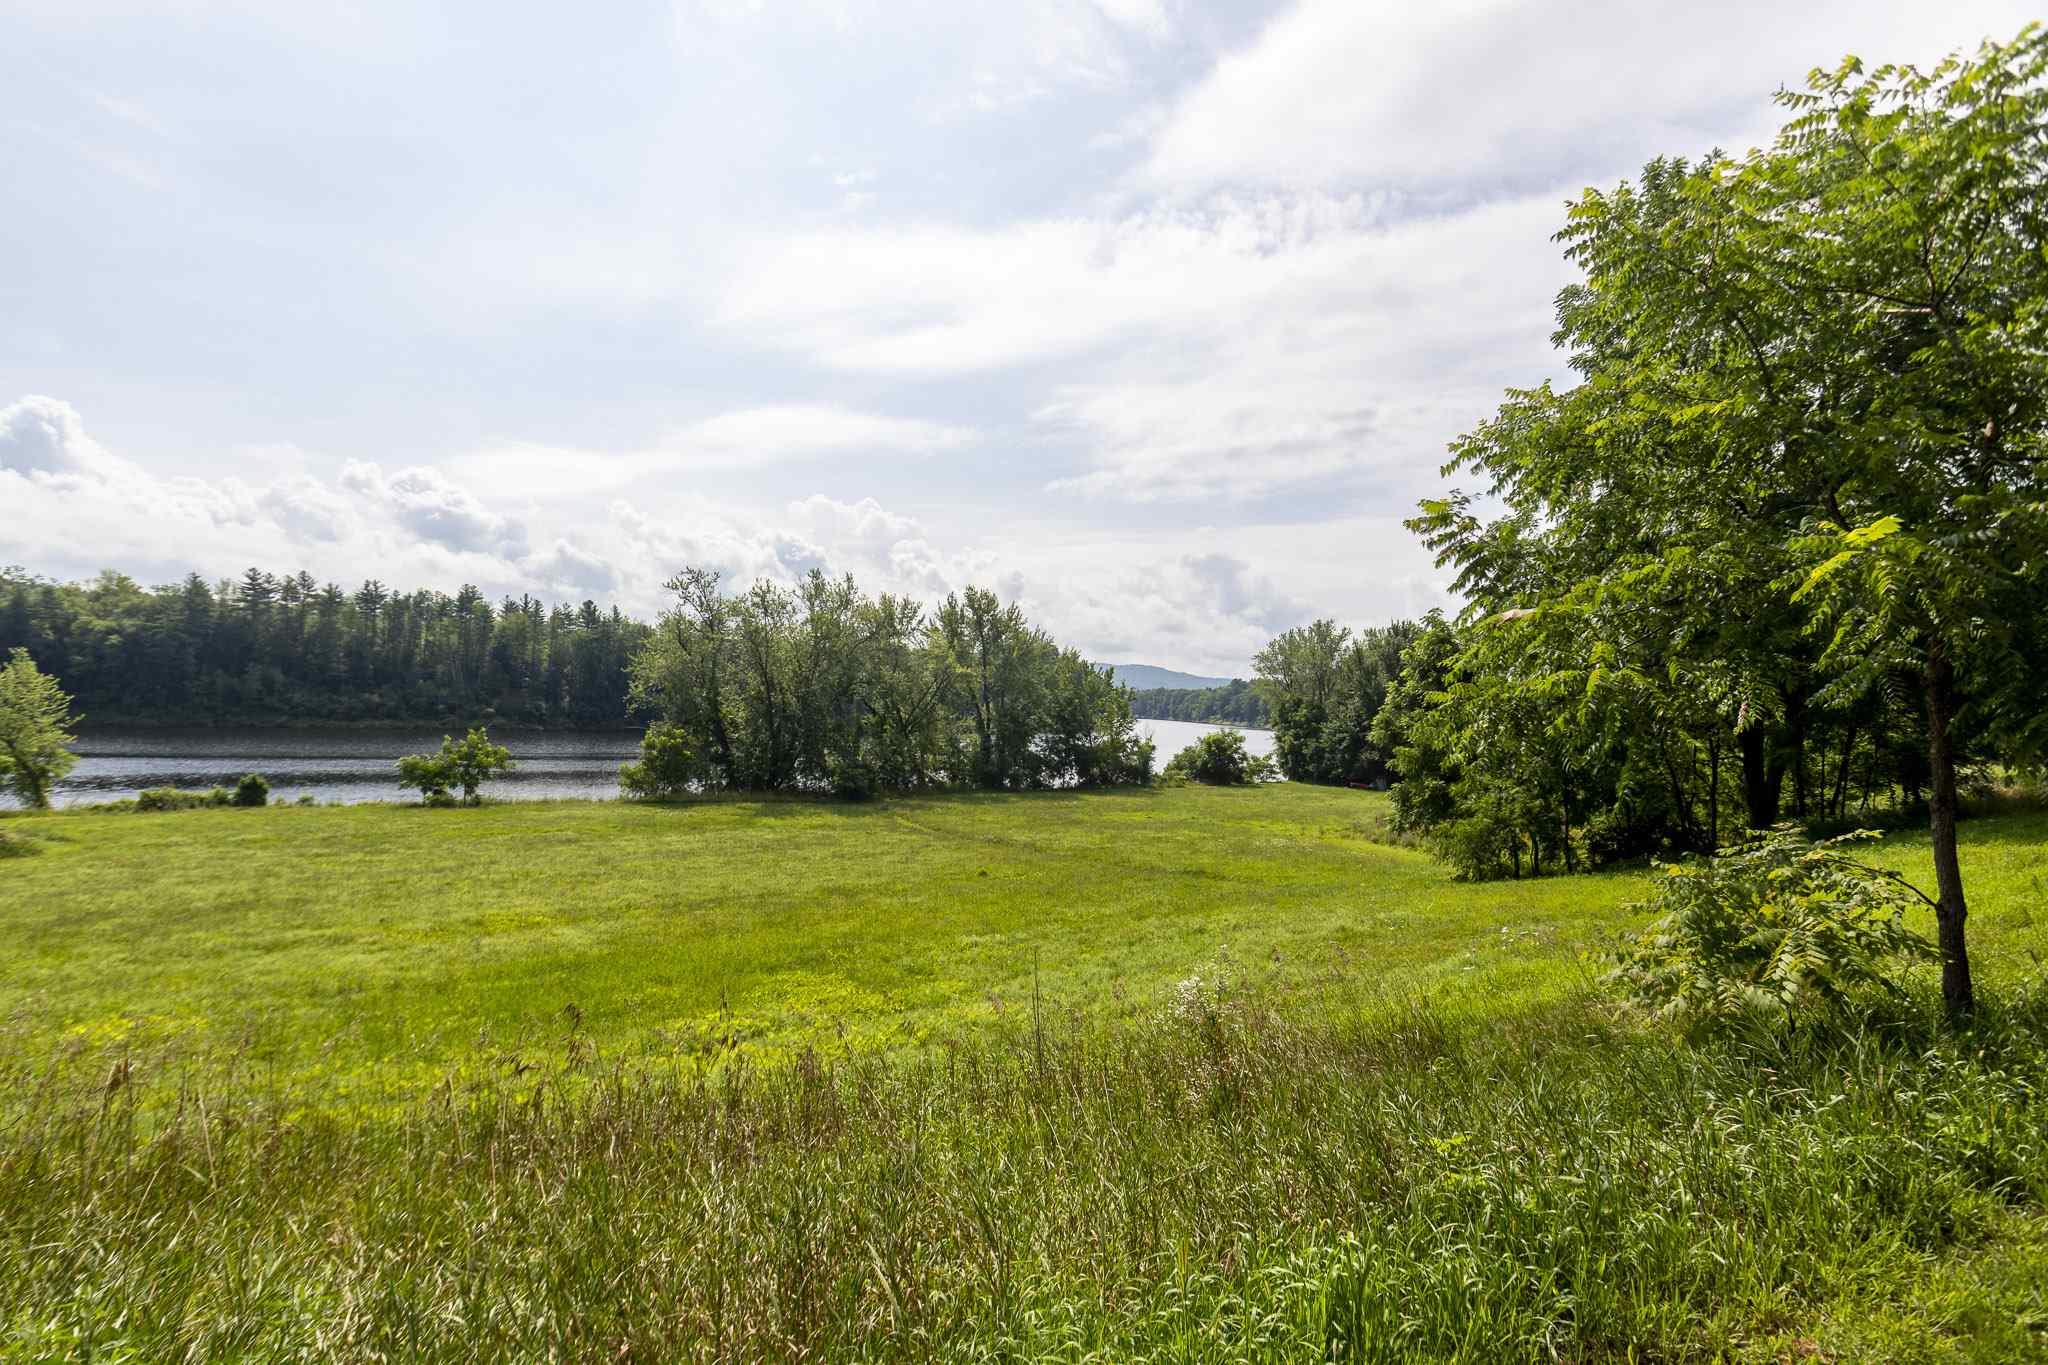 Open meadow for grazing 12501833